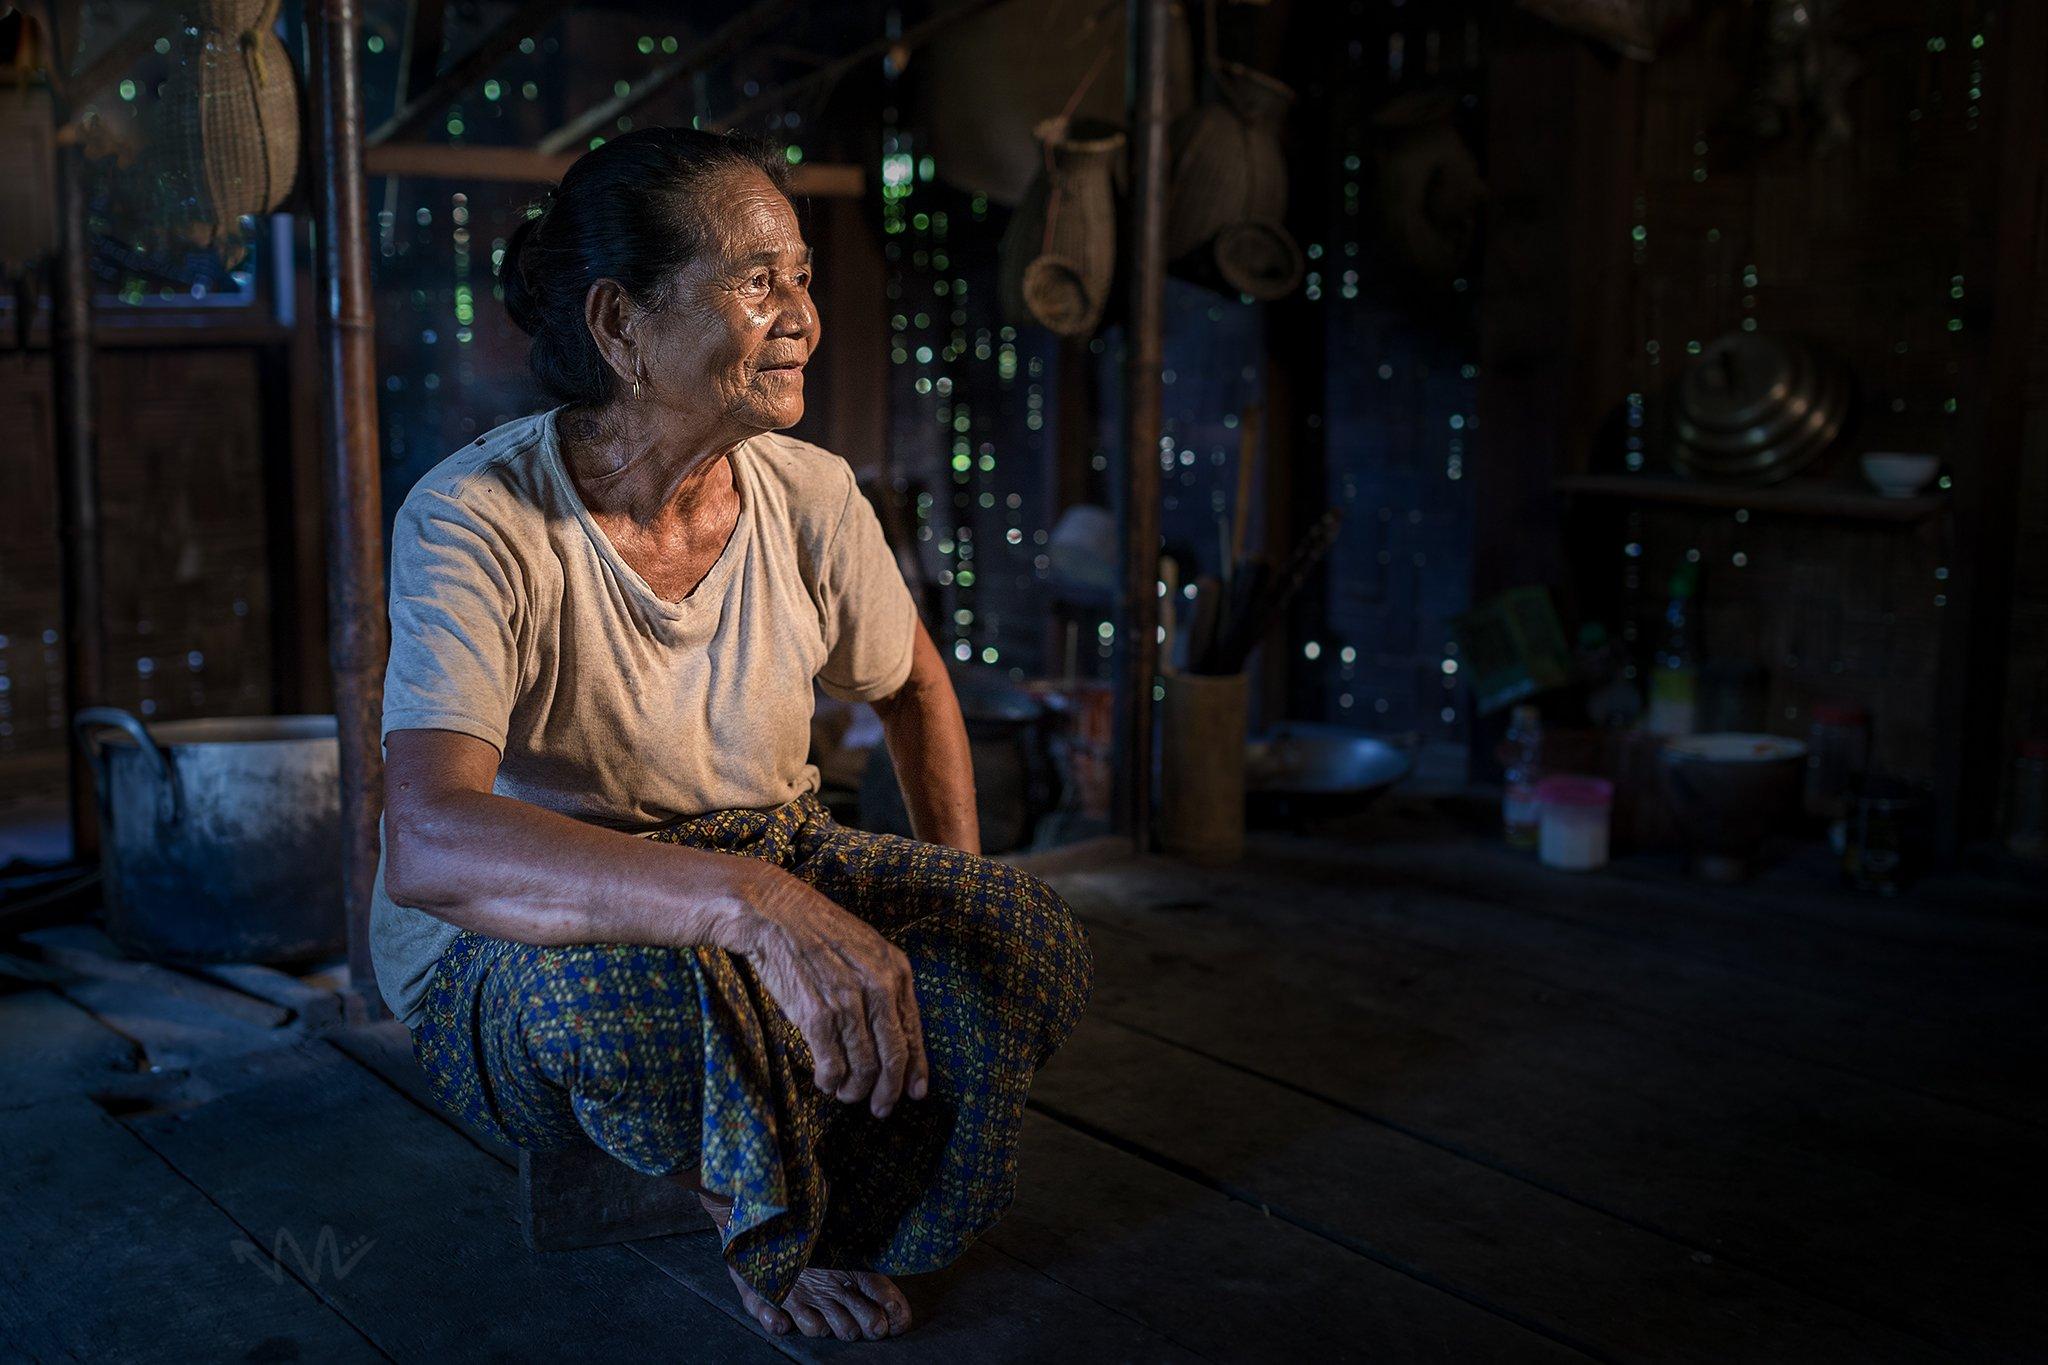 laos,senior,portrait,female,woman,Asia,lifesrtyle,, SUTIPOND SOMNAM